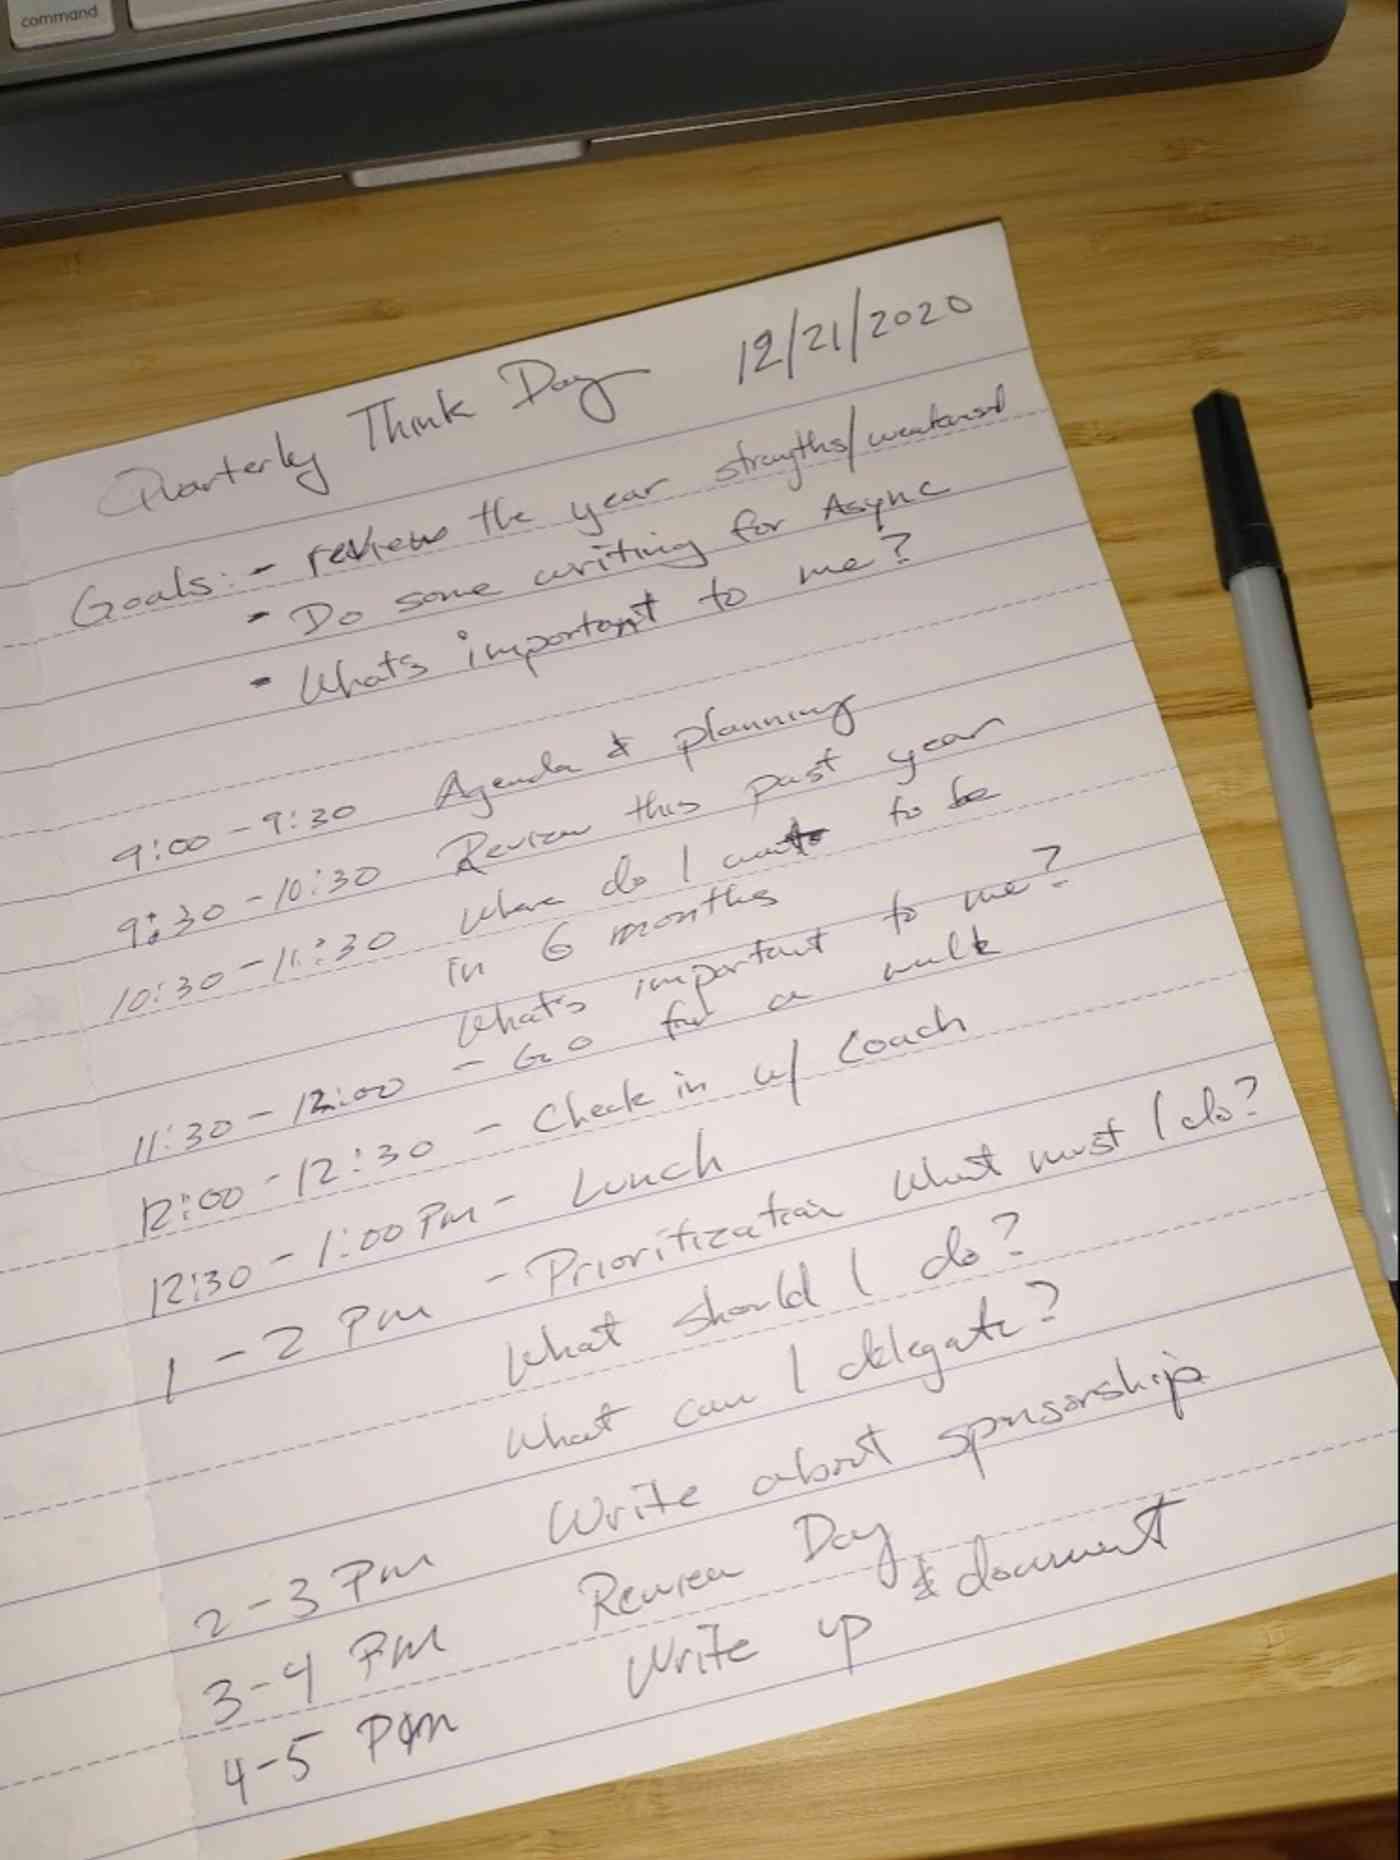 Thomas's agenda